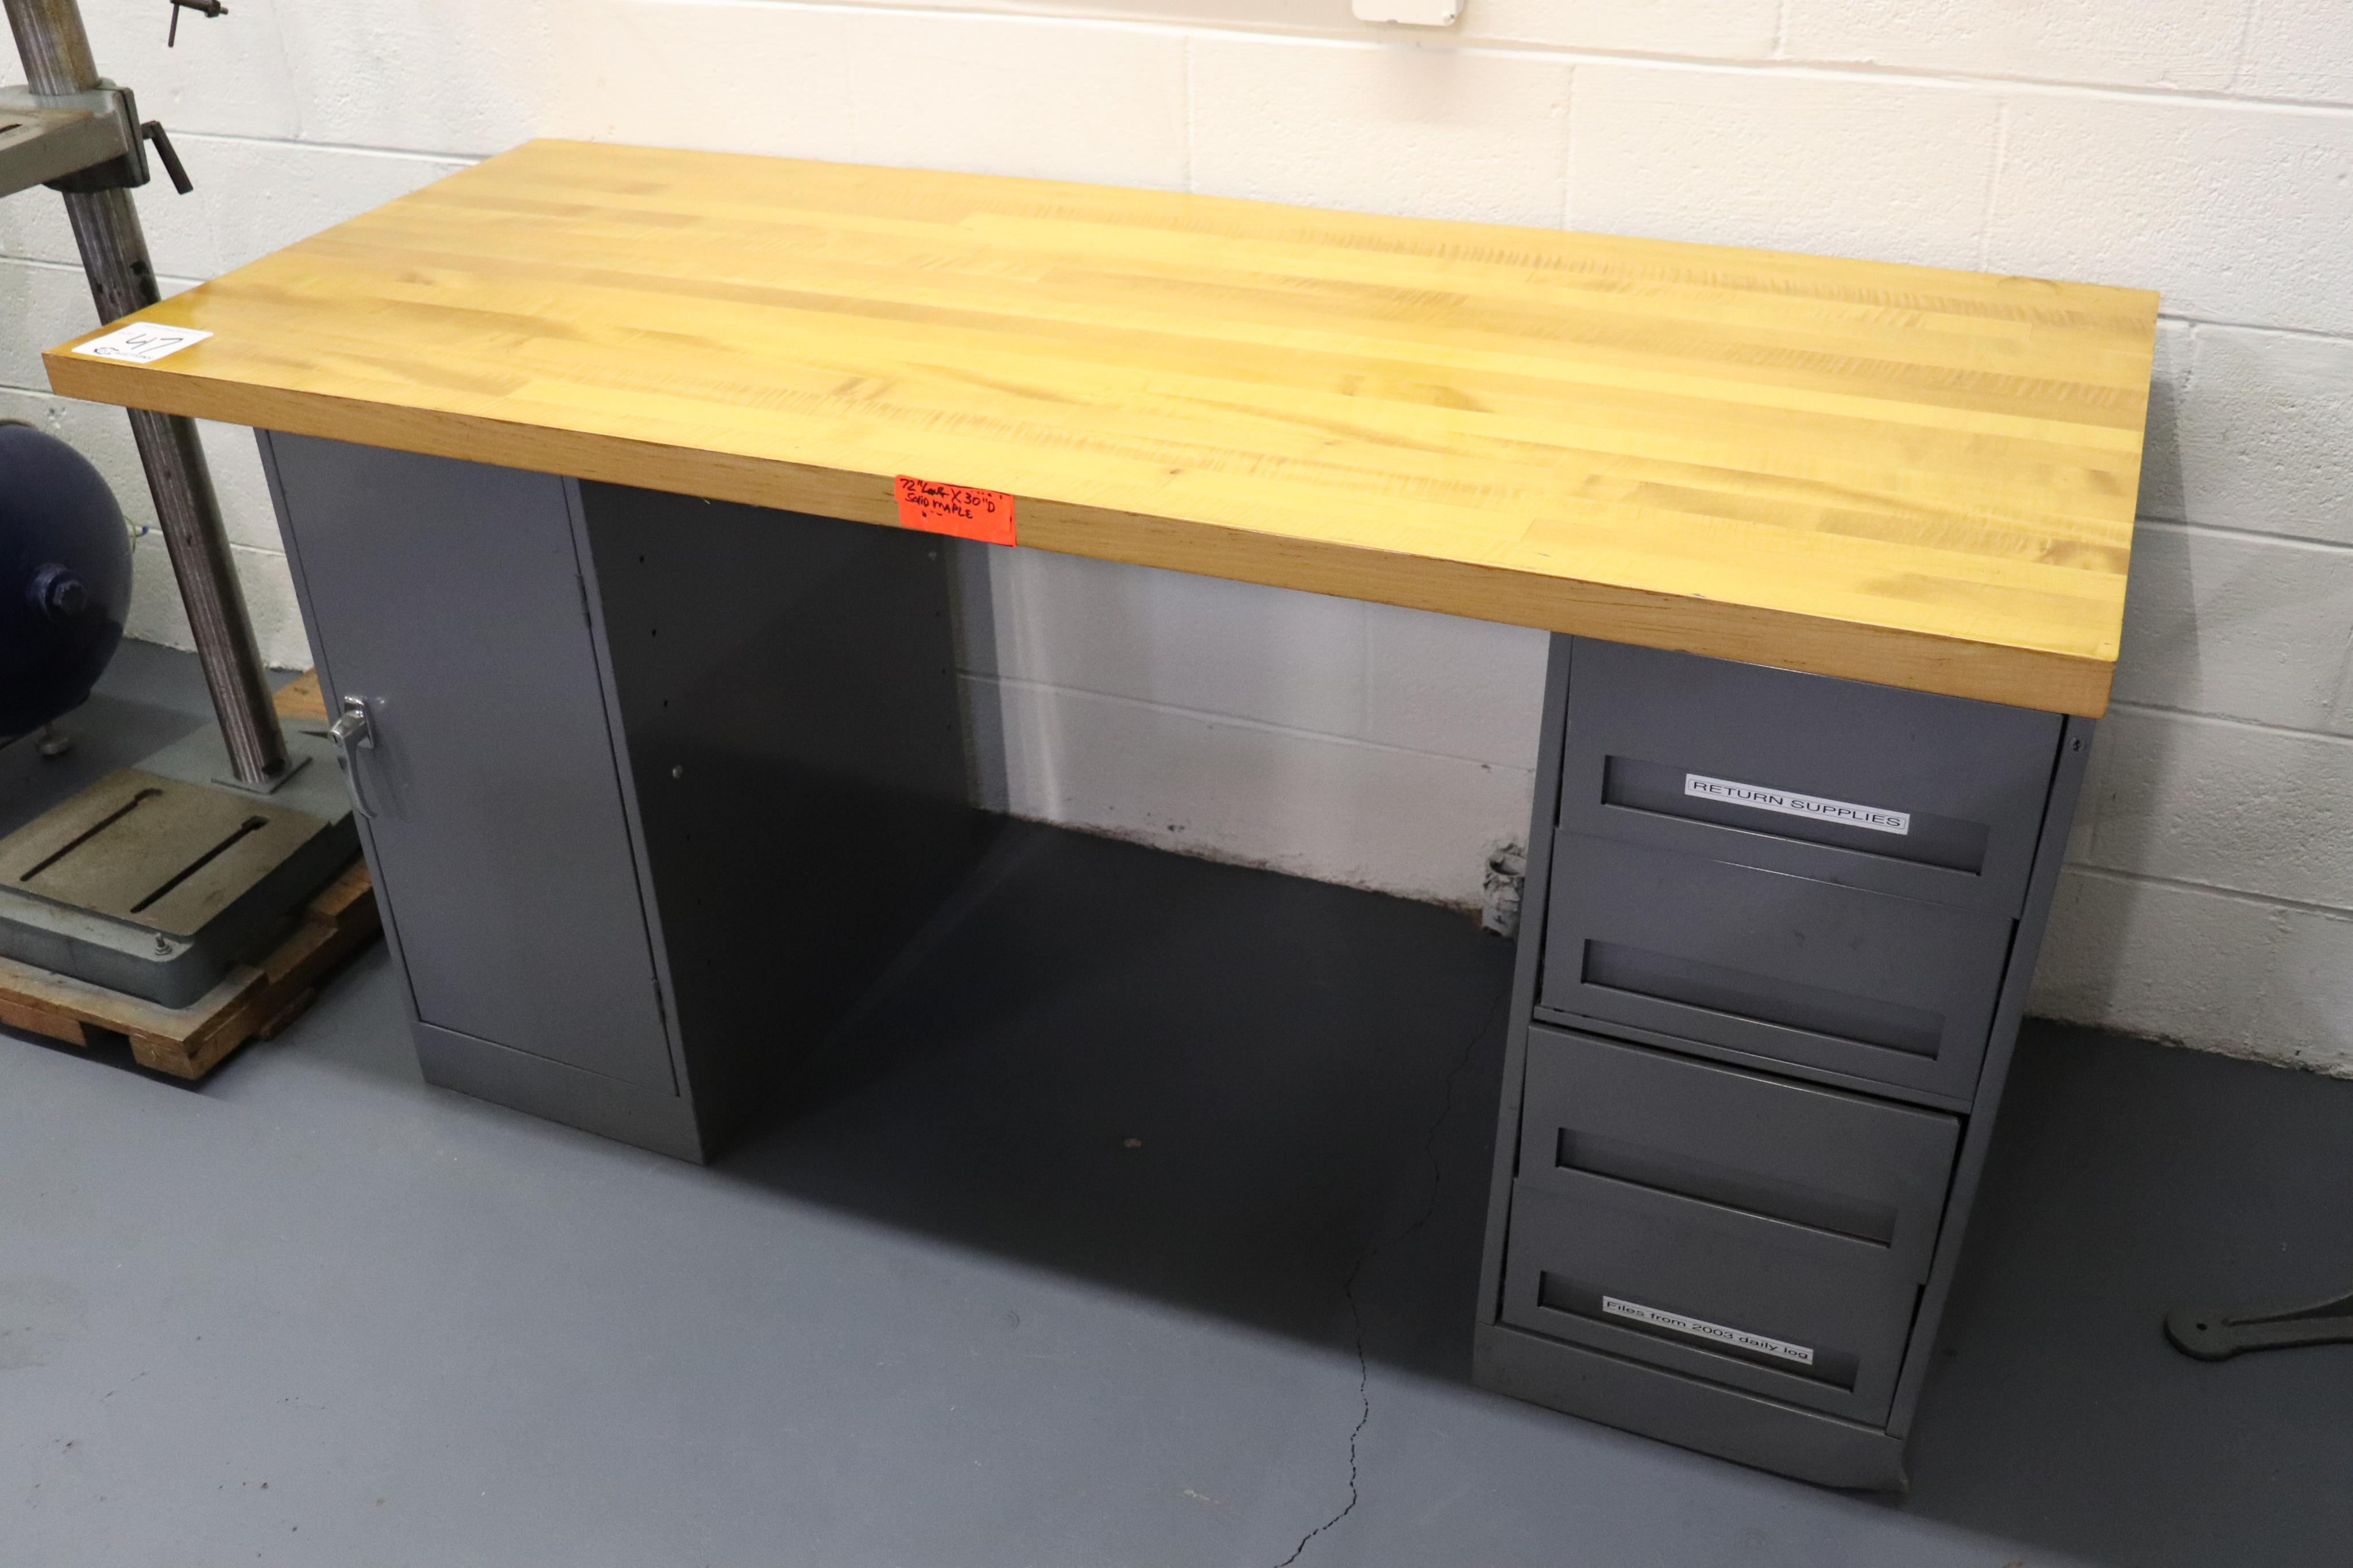 Butcher block work bench w/ cabinets